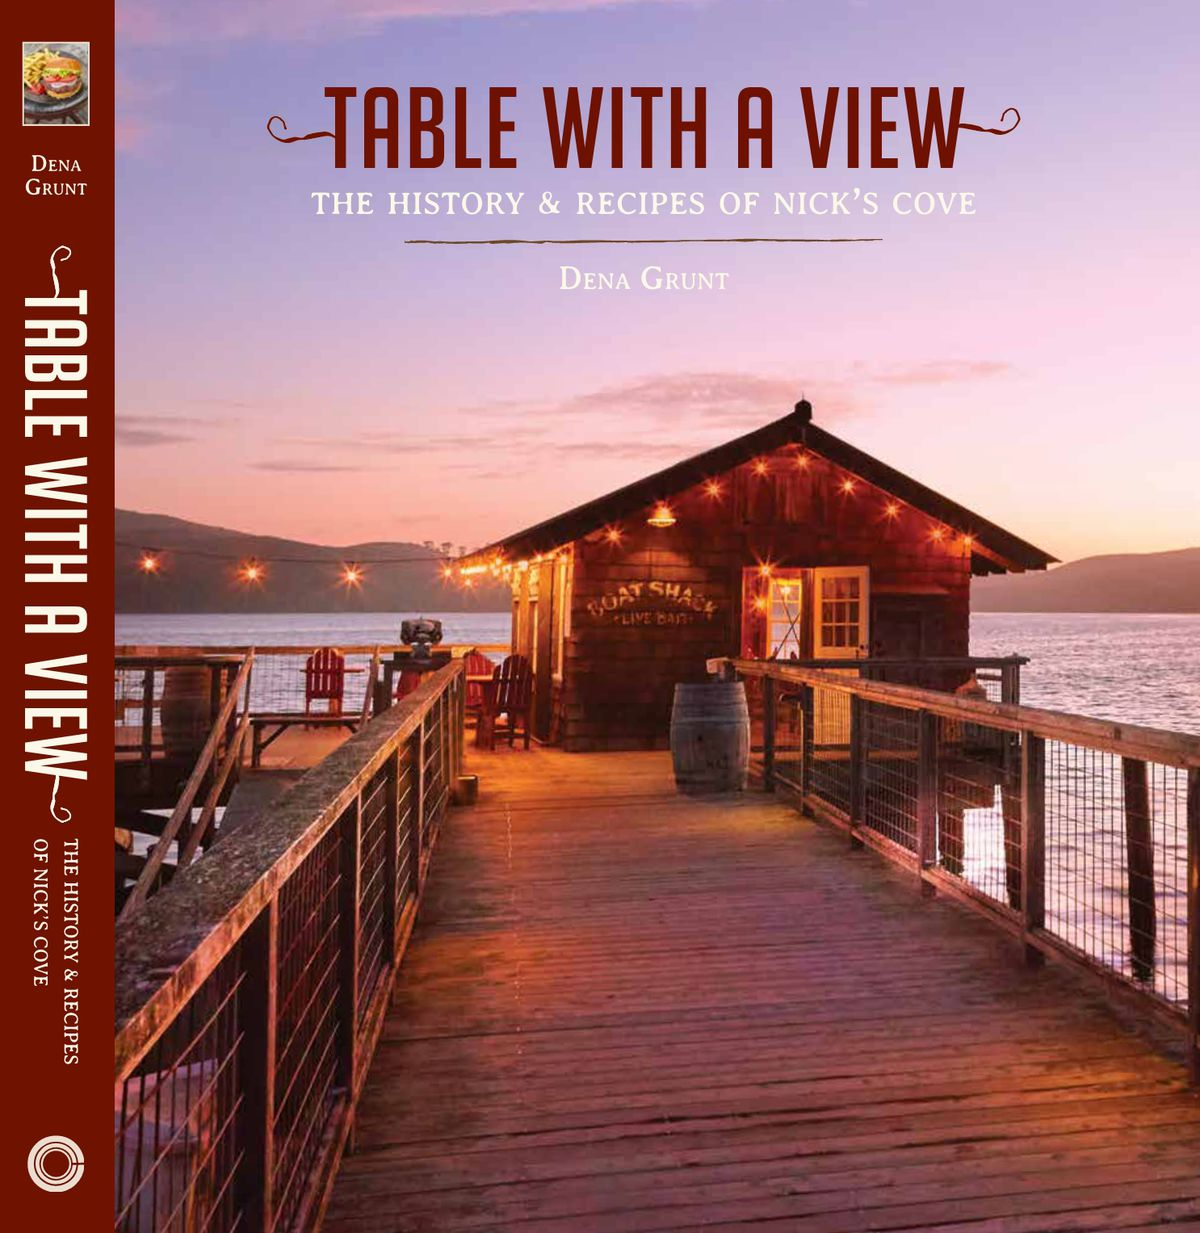 Nick's Cove cookbook cover